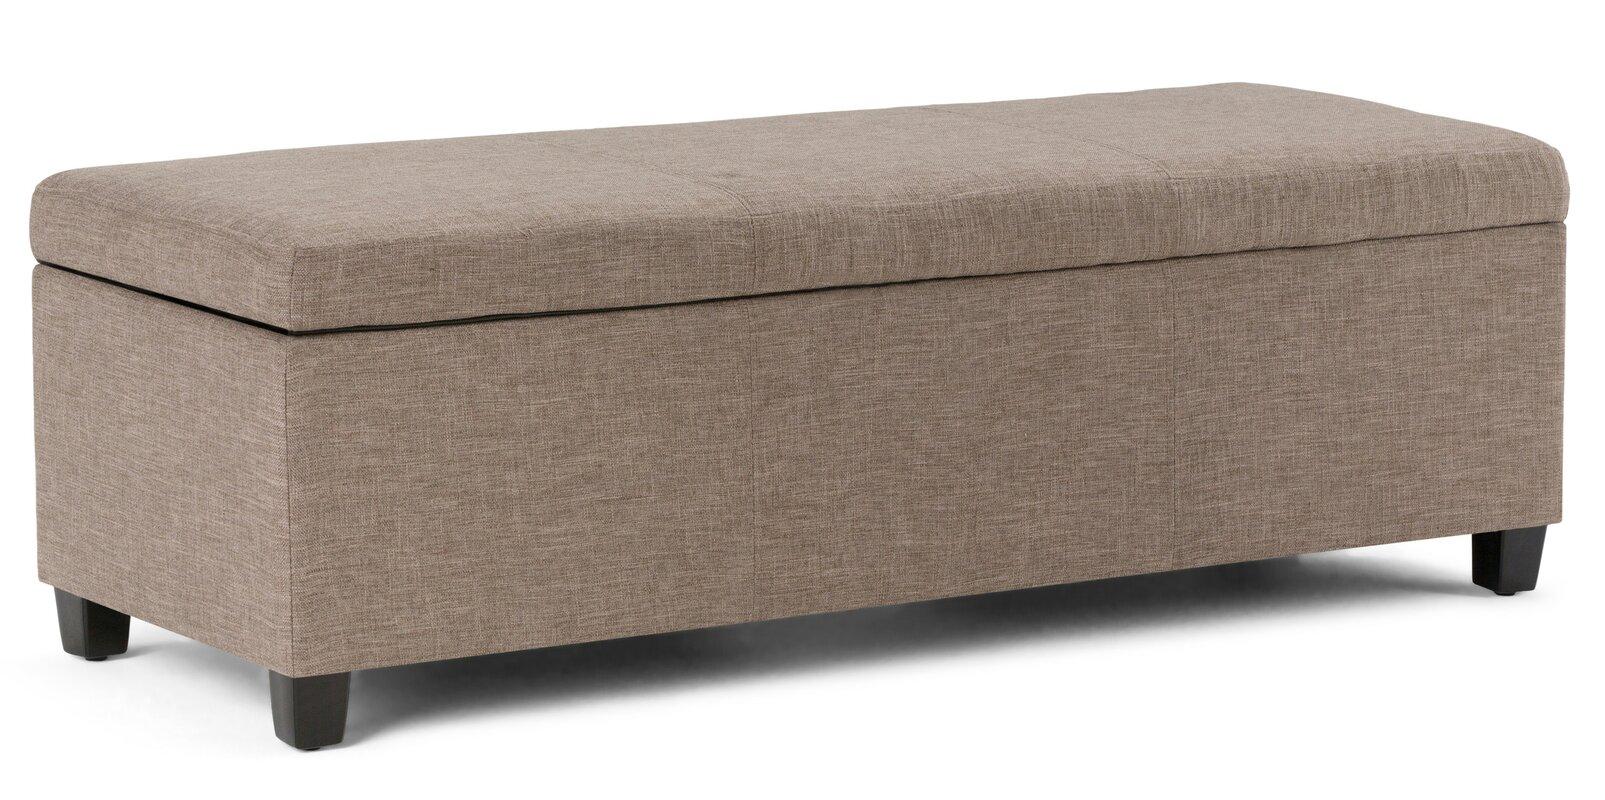 simpli home avalon upholstered storage bench  reviews  wayfair - defaultname